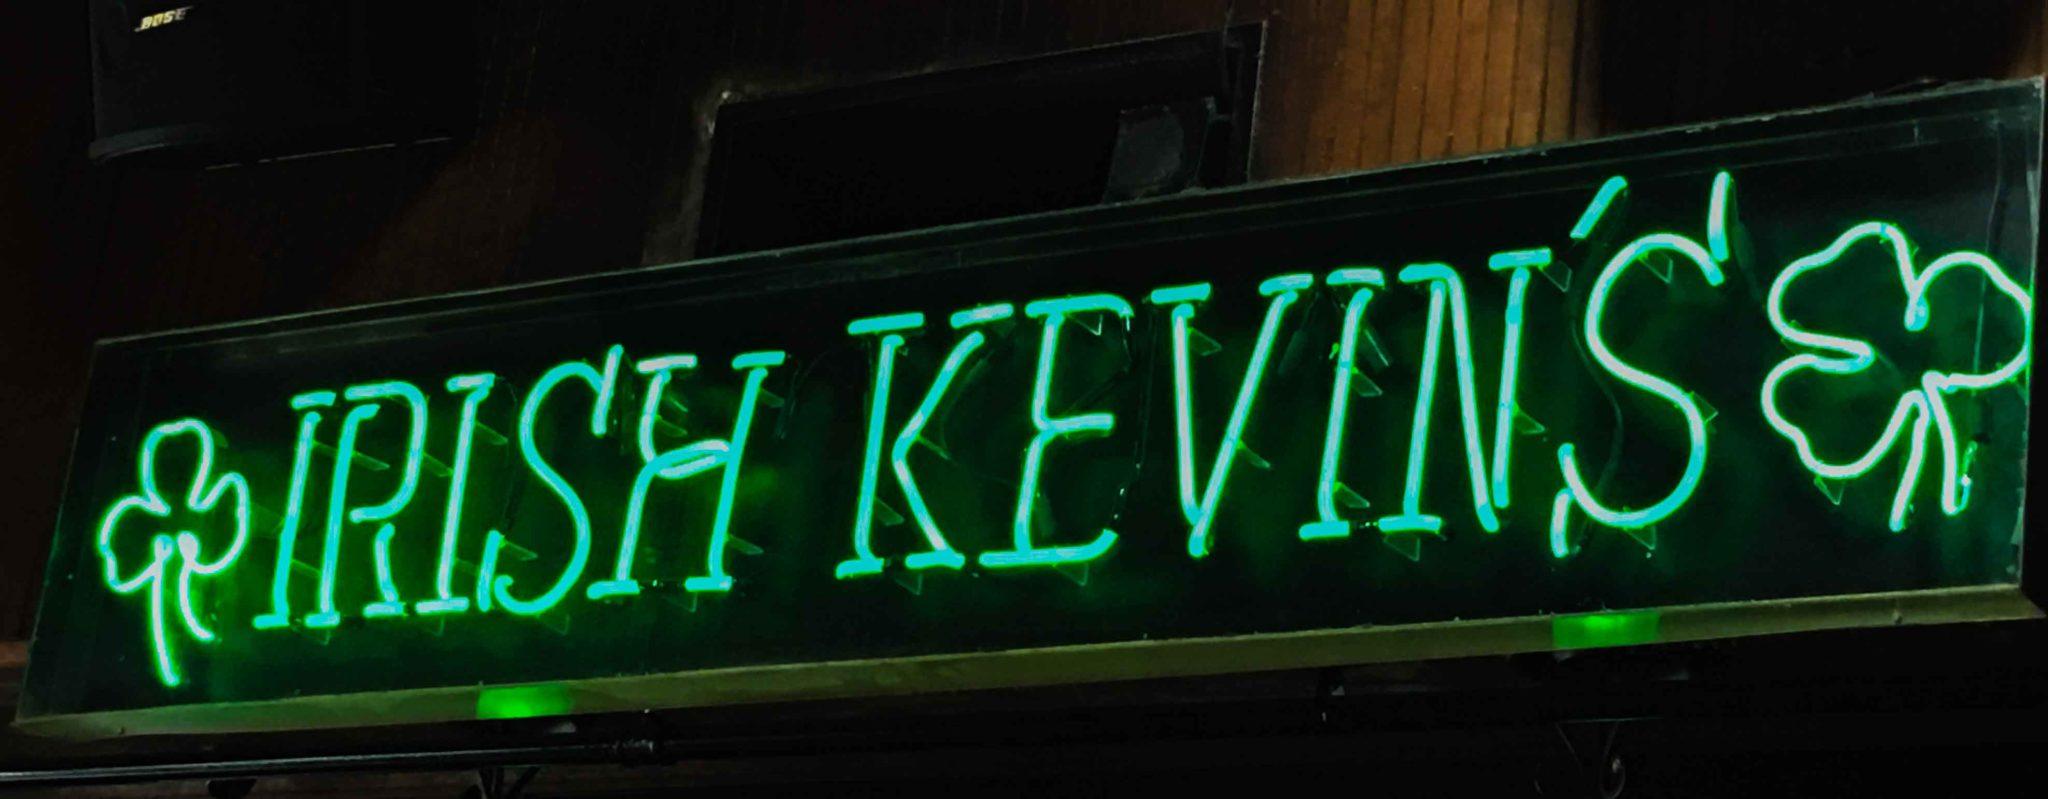 irish kevin's key west